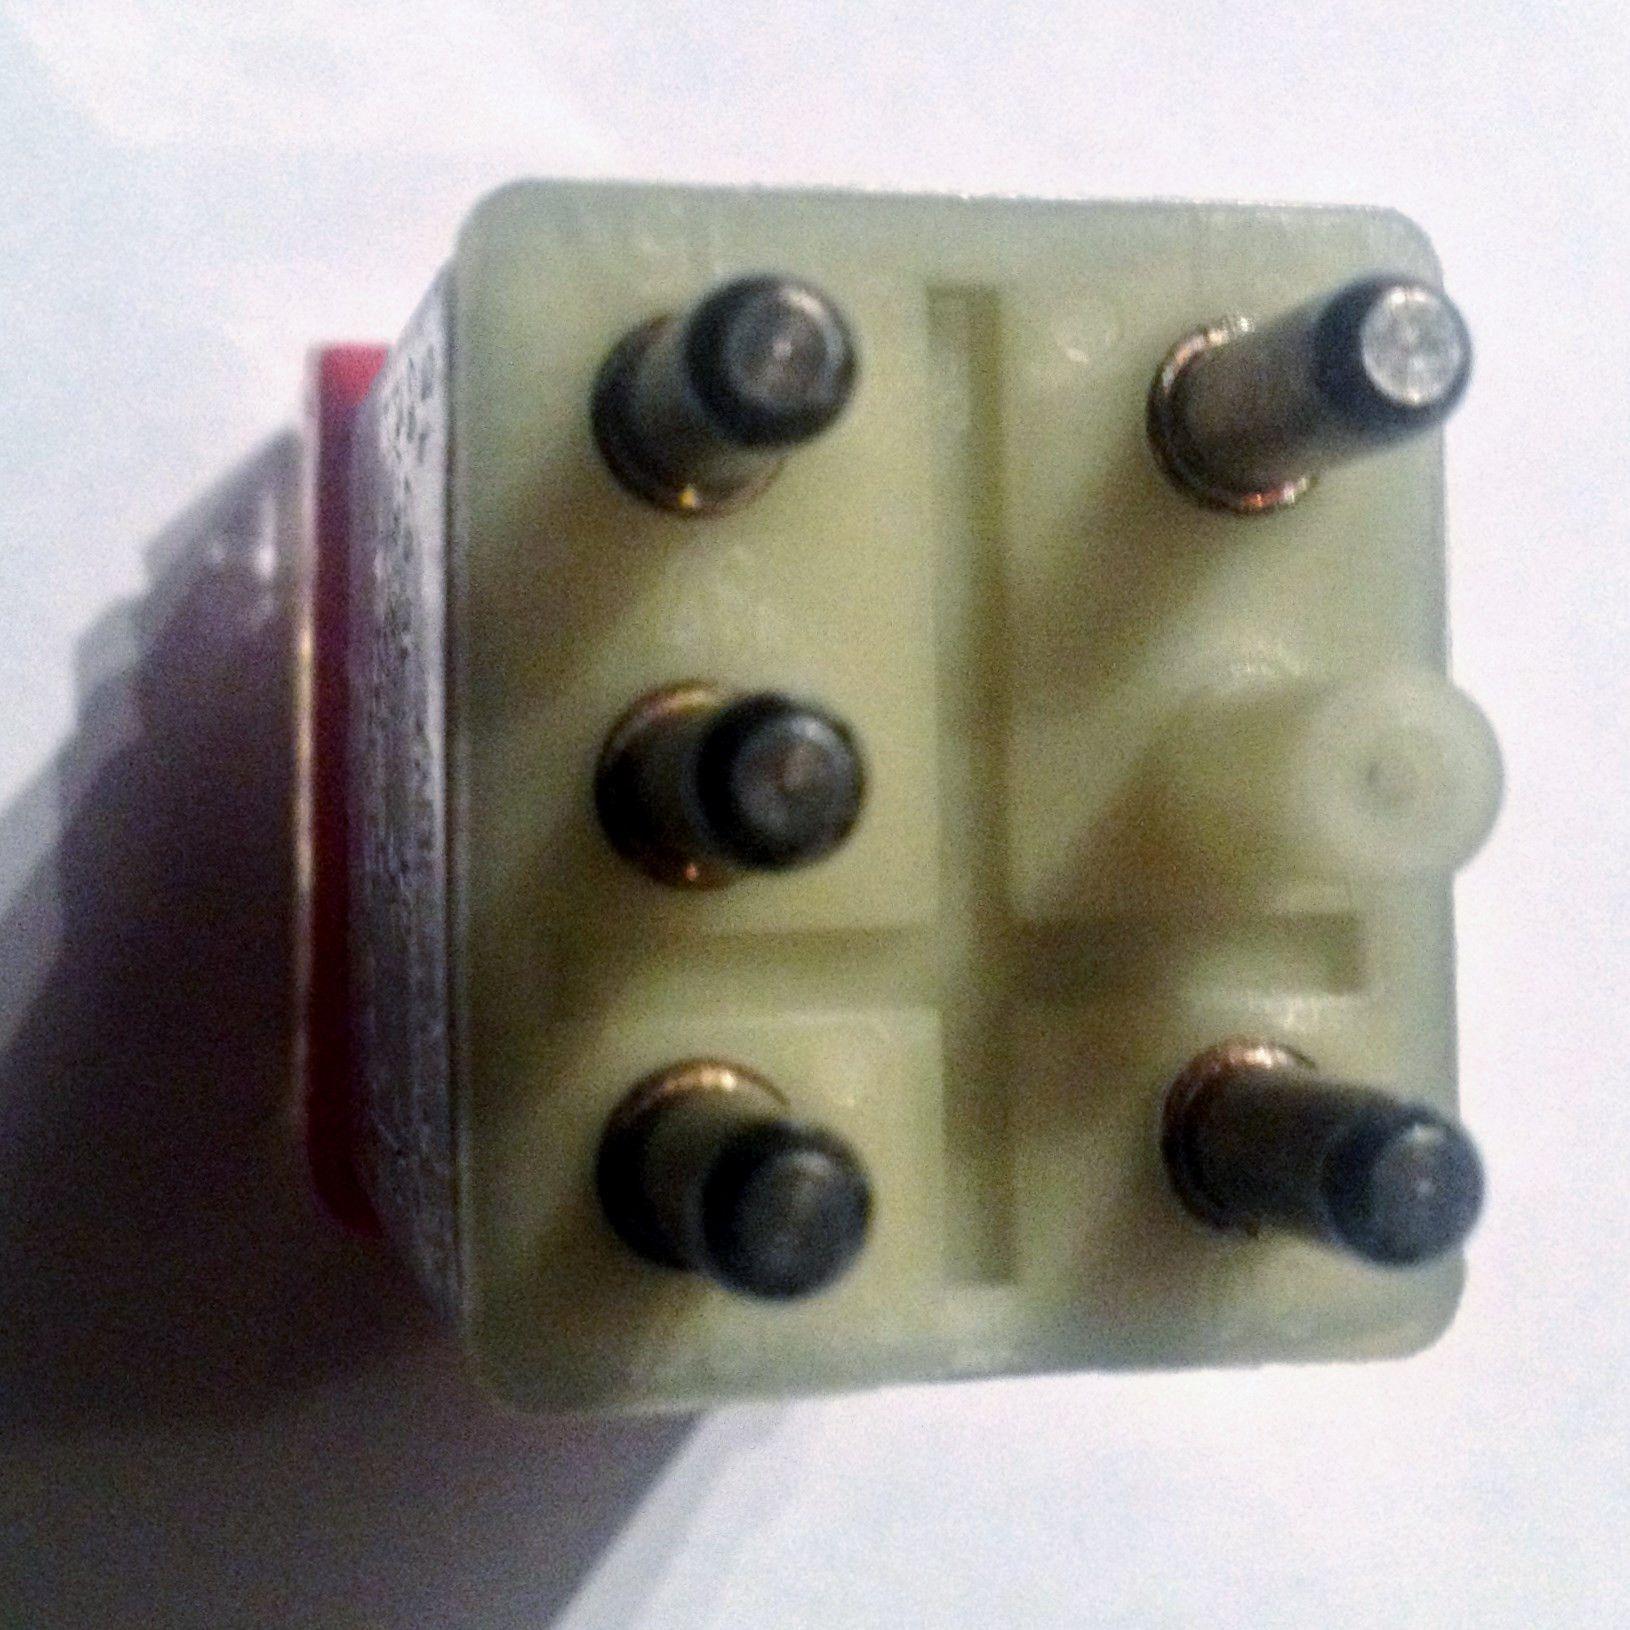 new mercedes benz w107 unit control module fuse box with fuse [ 1630 x 1630 Pixel ]